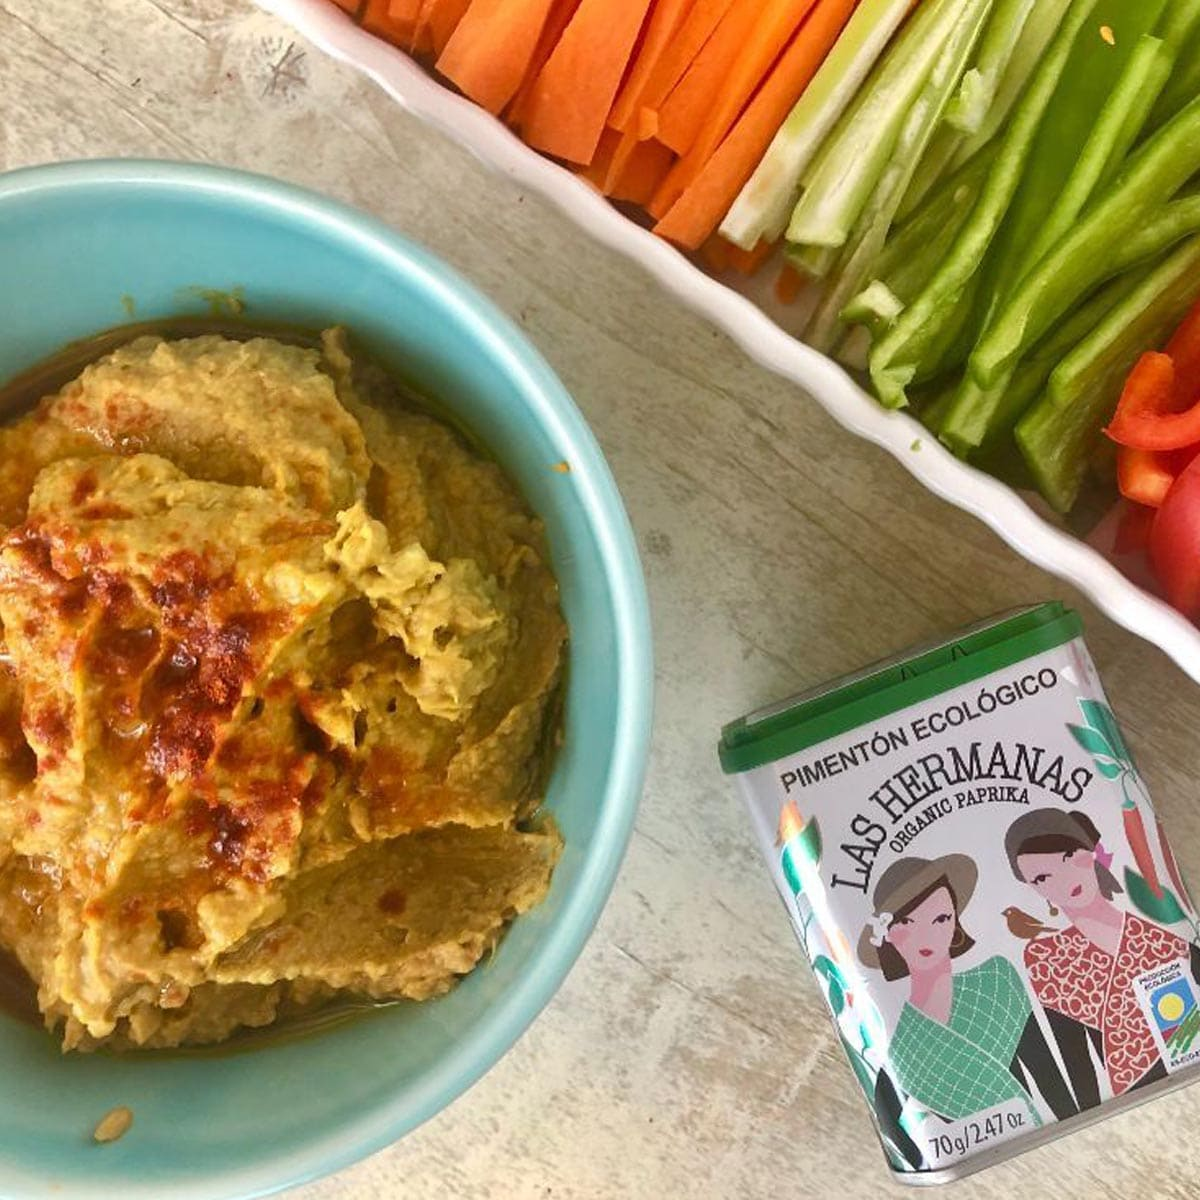 Hummus Travieso de Aguacate con Pimentón Ecológico